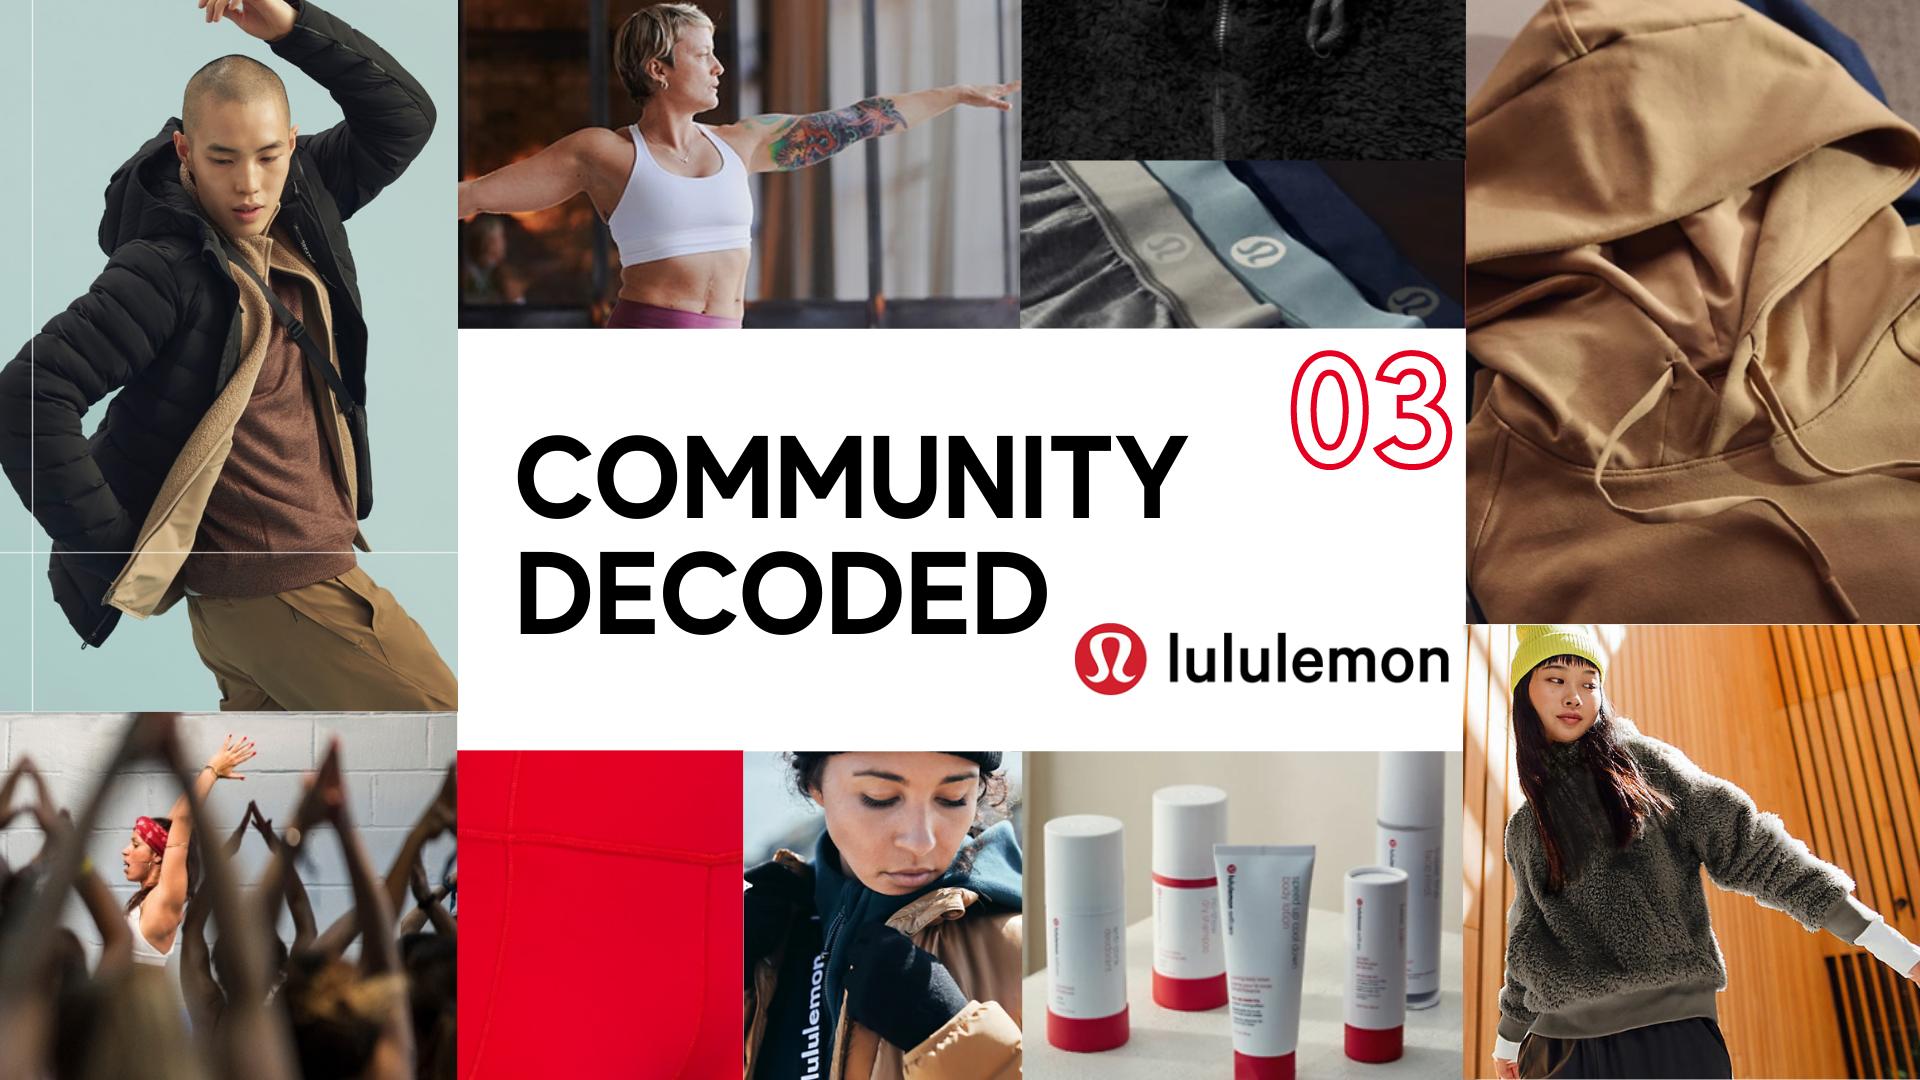 Analyzing Lululemon's brand community strategy